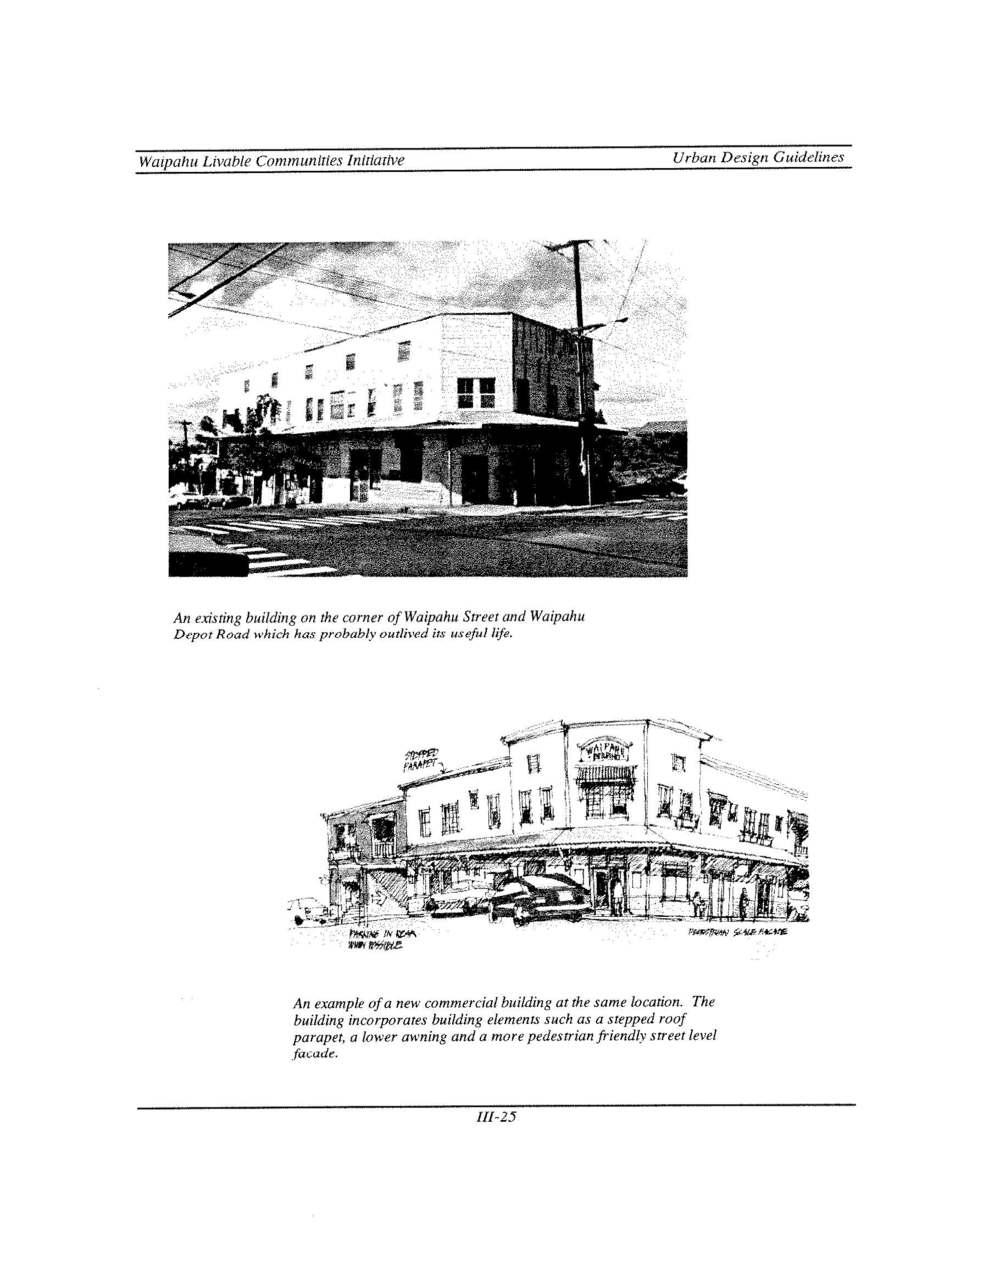 160531_WaipahuLivableCommunities(1998)_Page_115.jpg